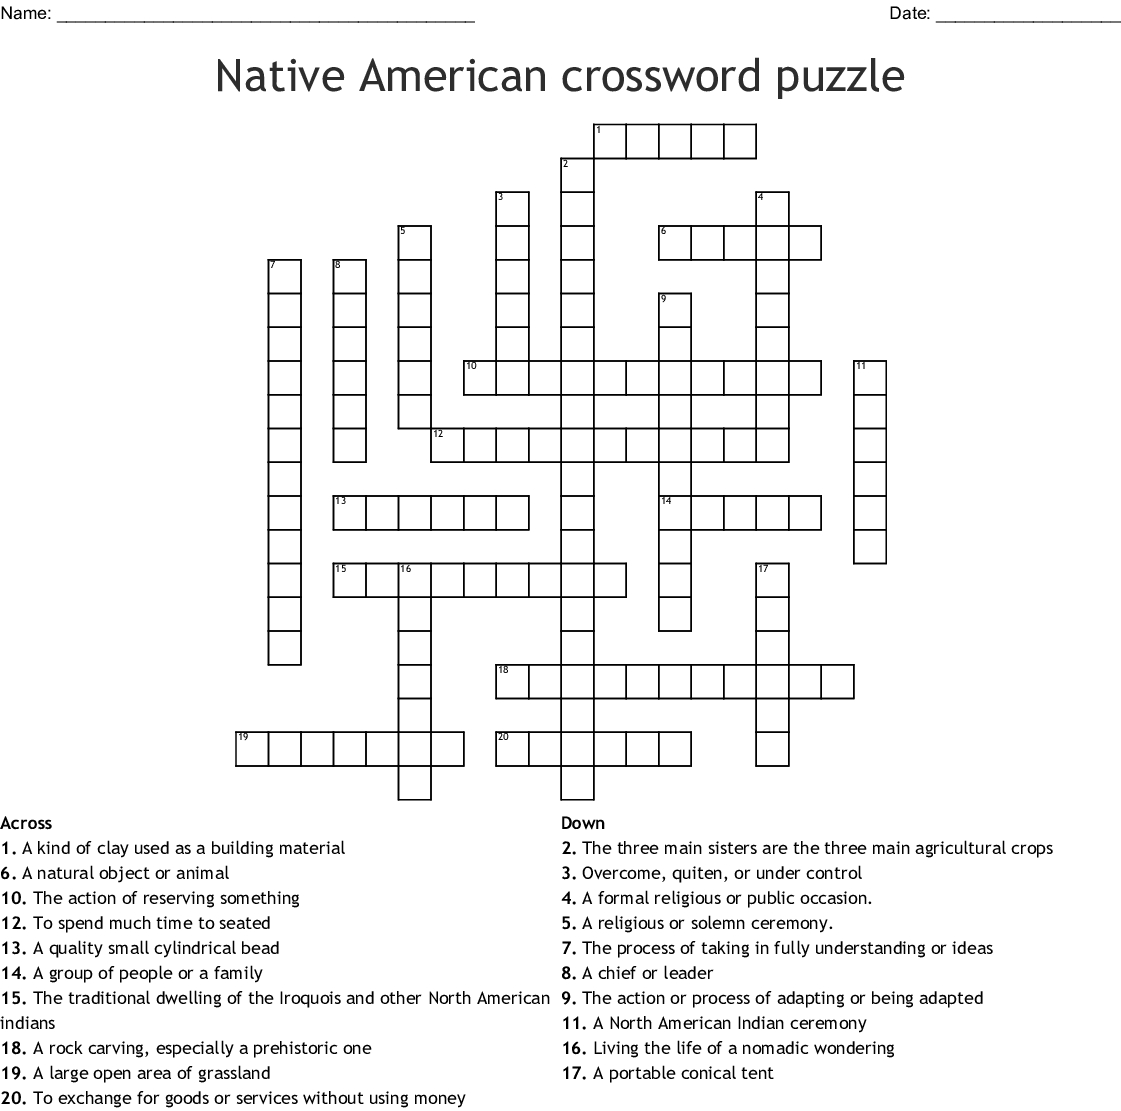 Native American Crossword Puzzle Crossword - Wordmint - Native American Crossword Puzzle Printable